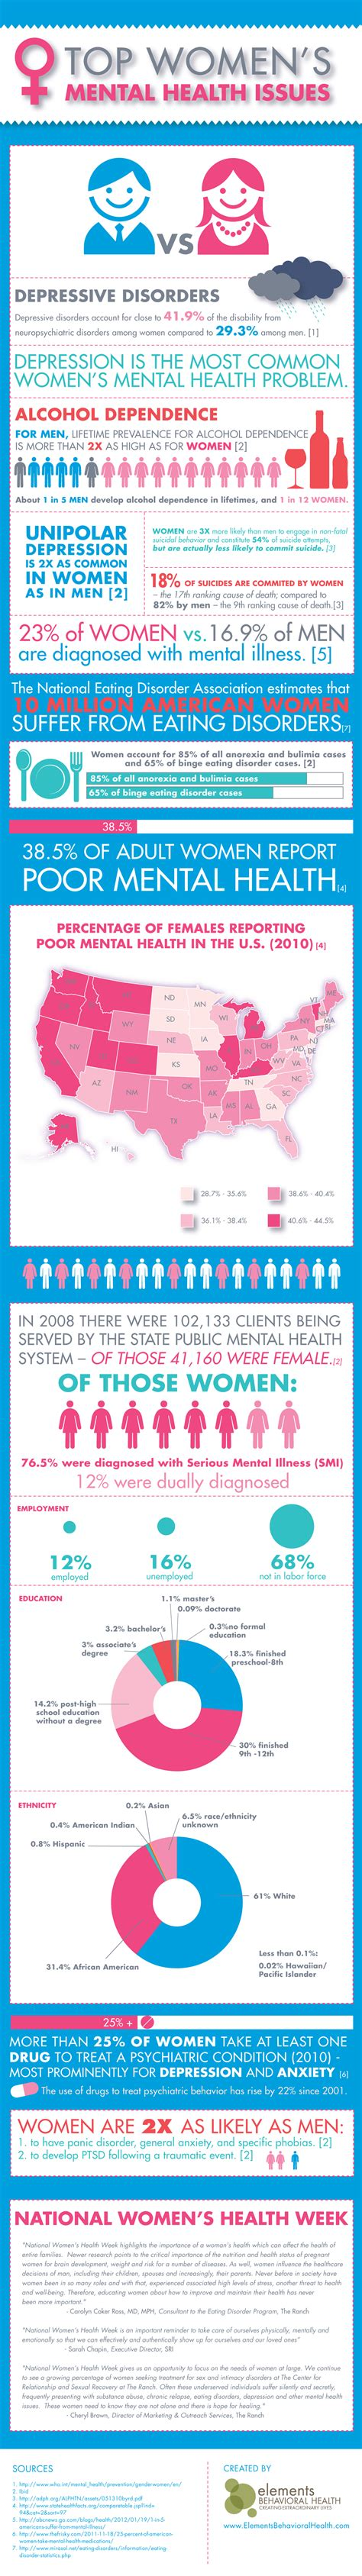 female masturtbation mental health issues picture 9